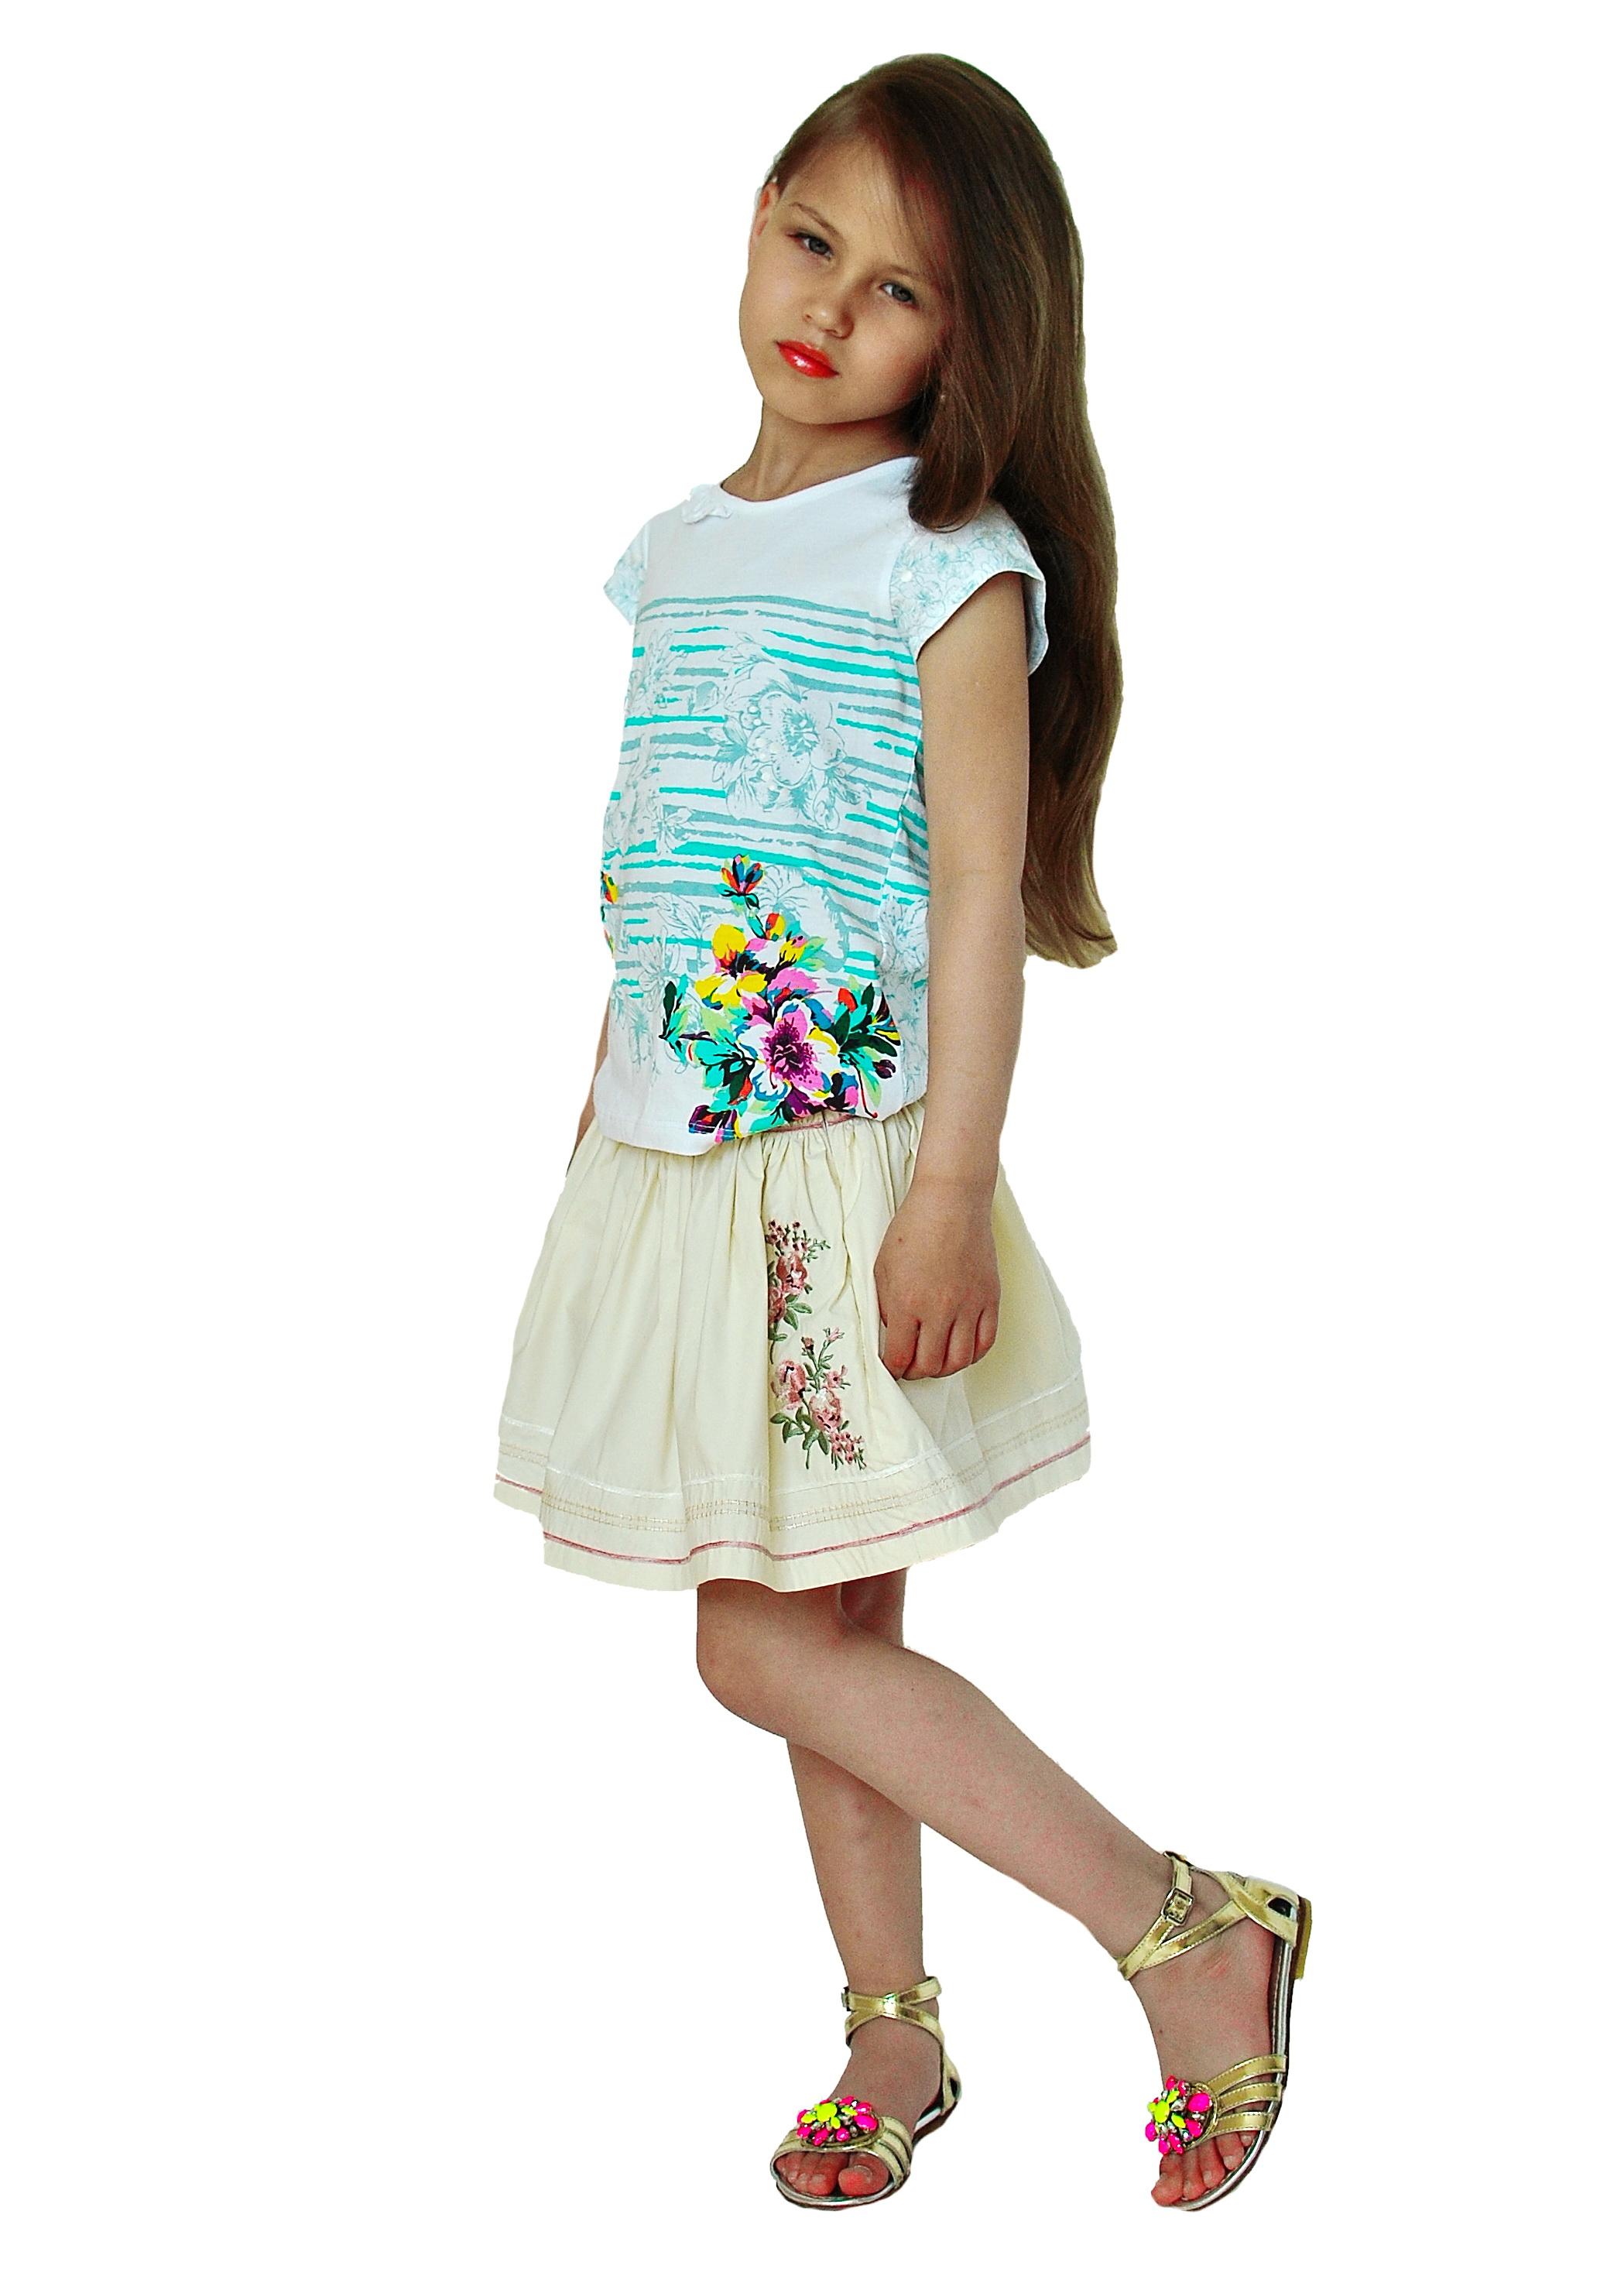 Фото 5: Яркая футболка Kenzo для девочек